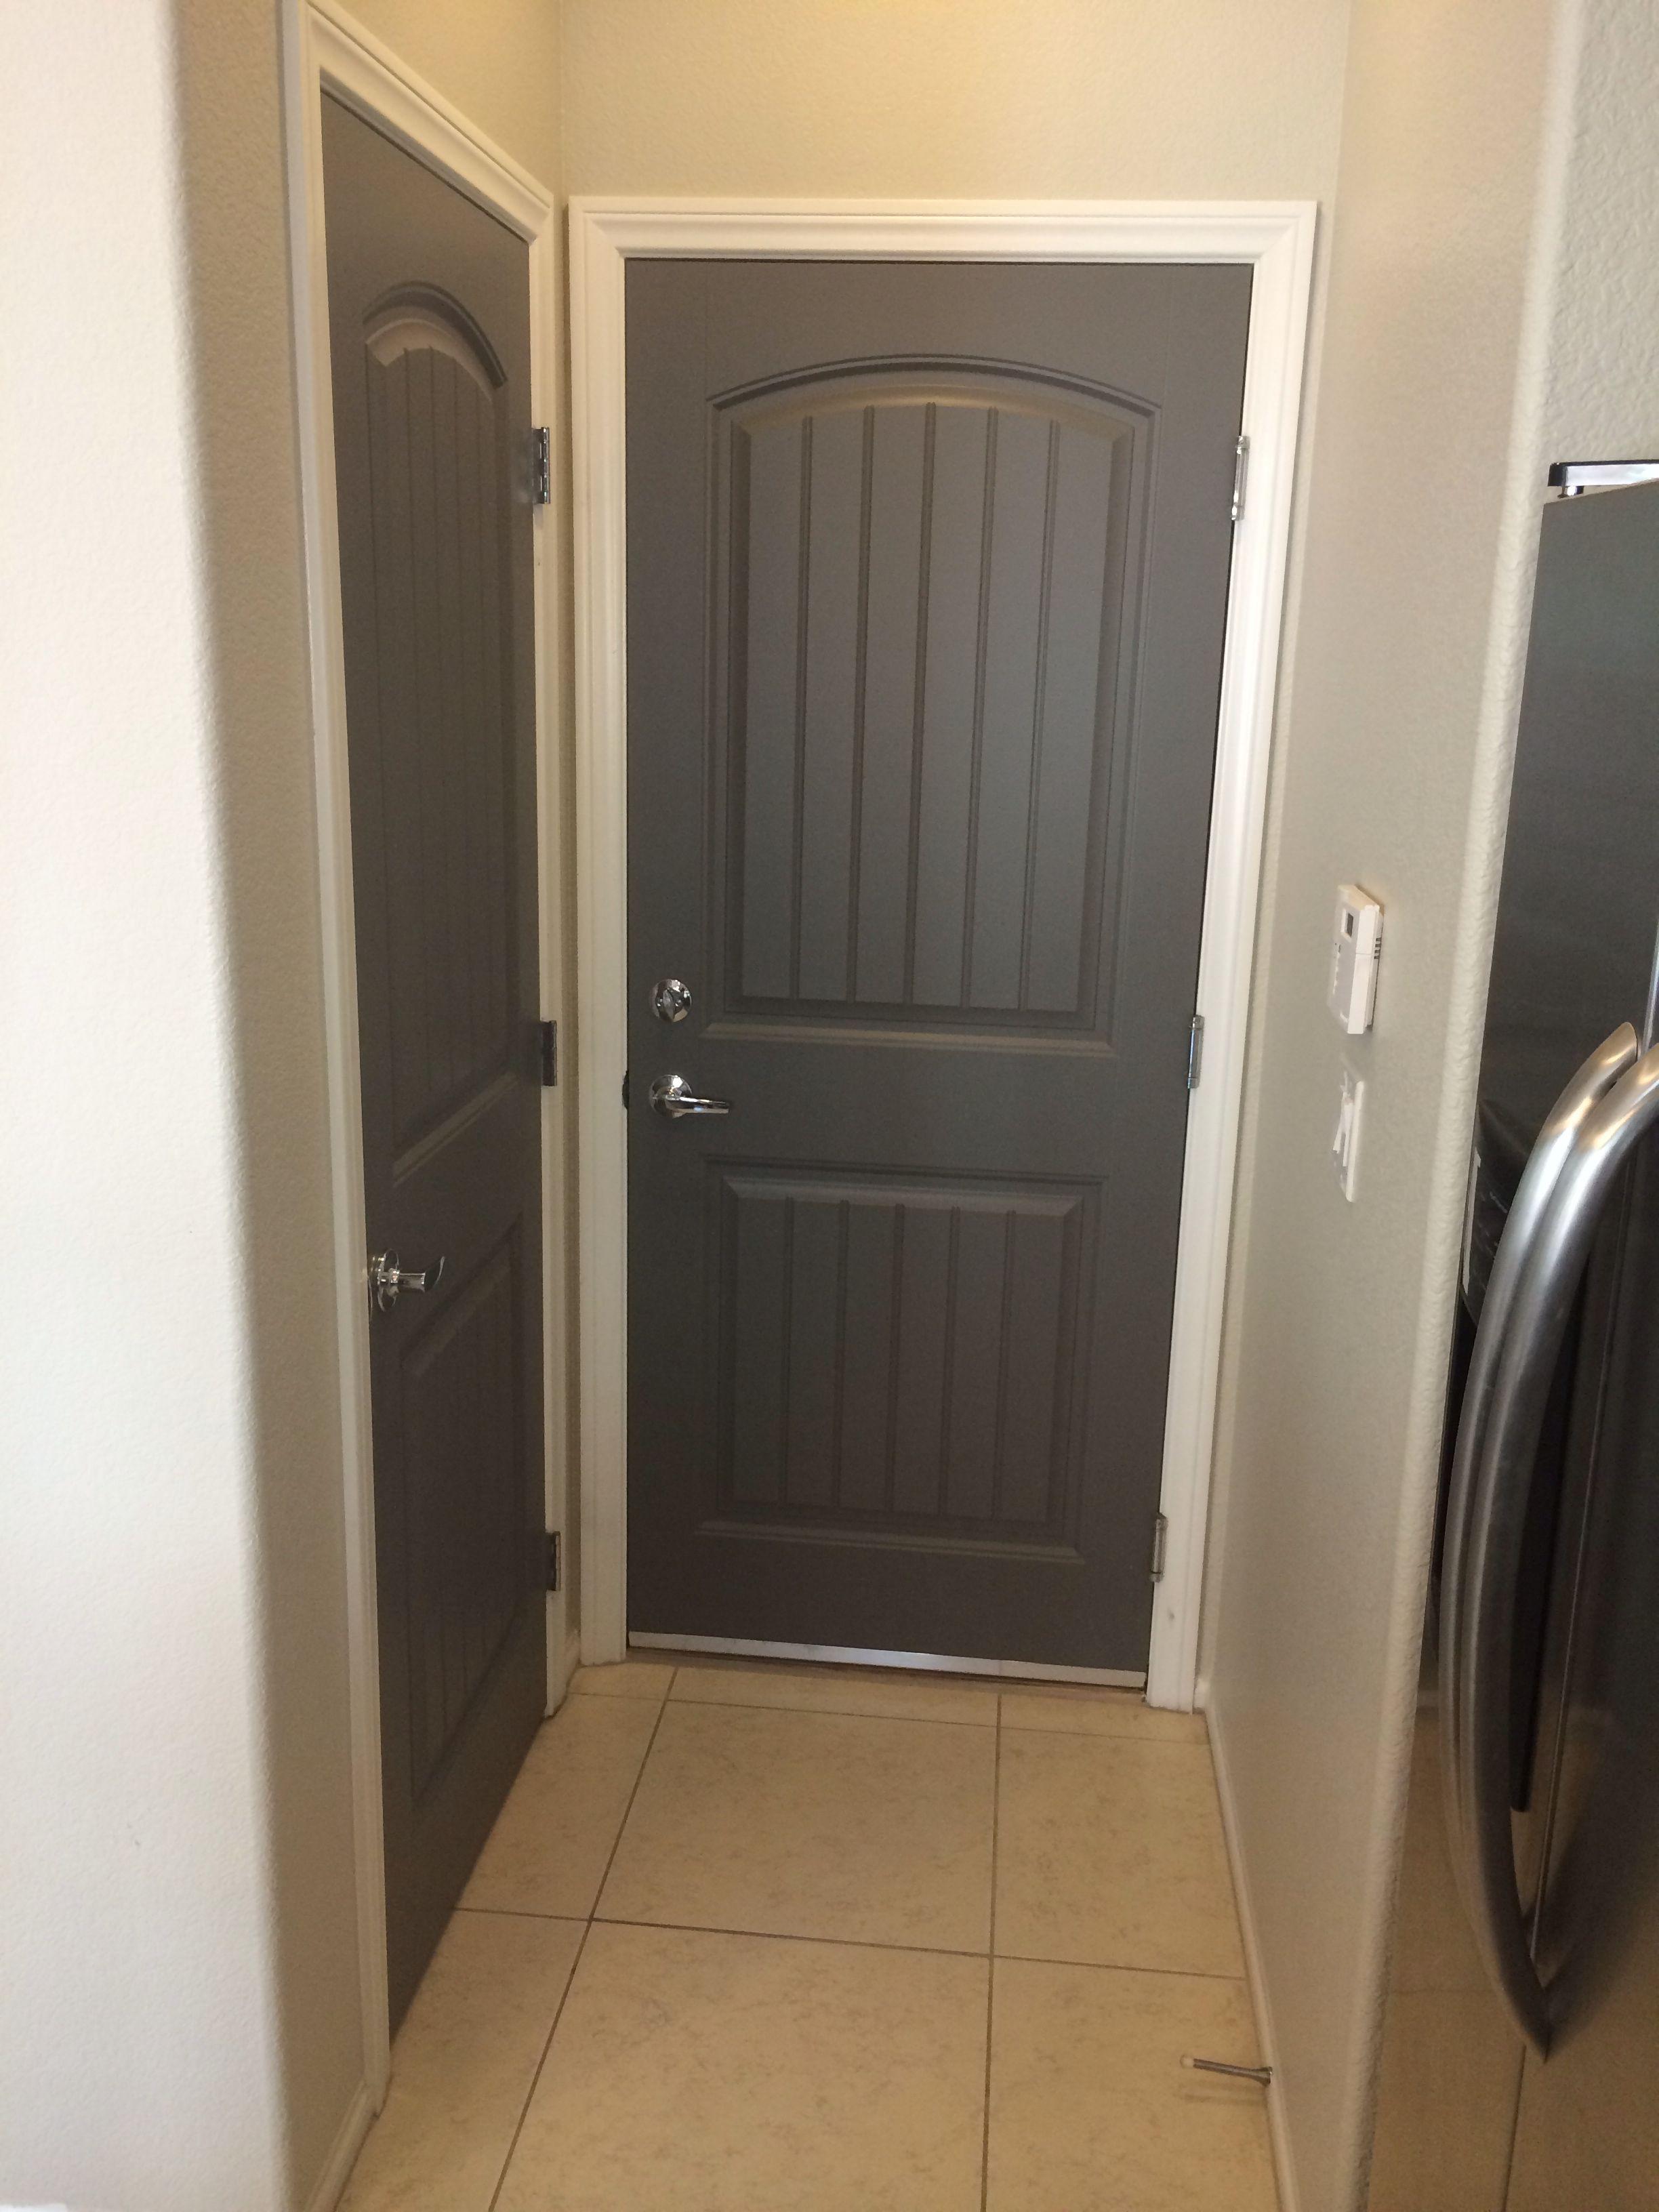 Gauntlet Gray Doors Repose Gray Walls Interior Door Colors Grey Interior Doors Doors Interior